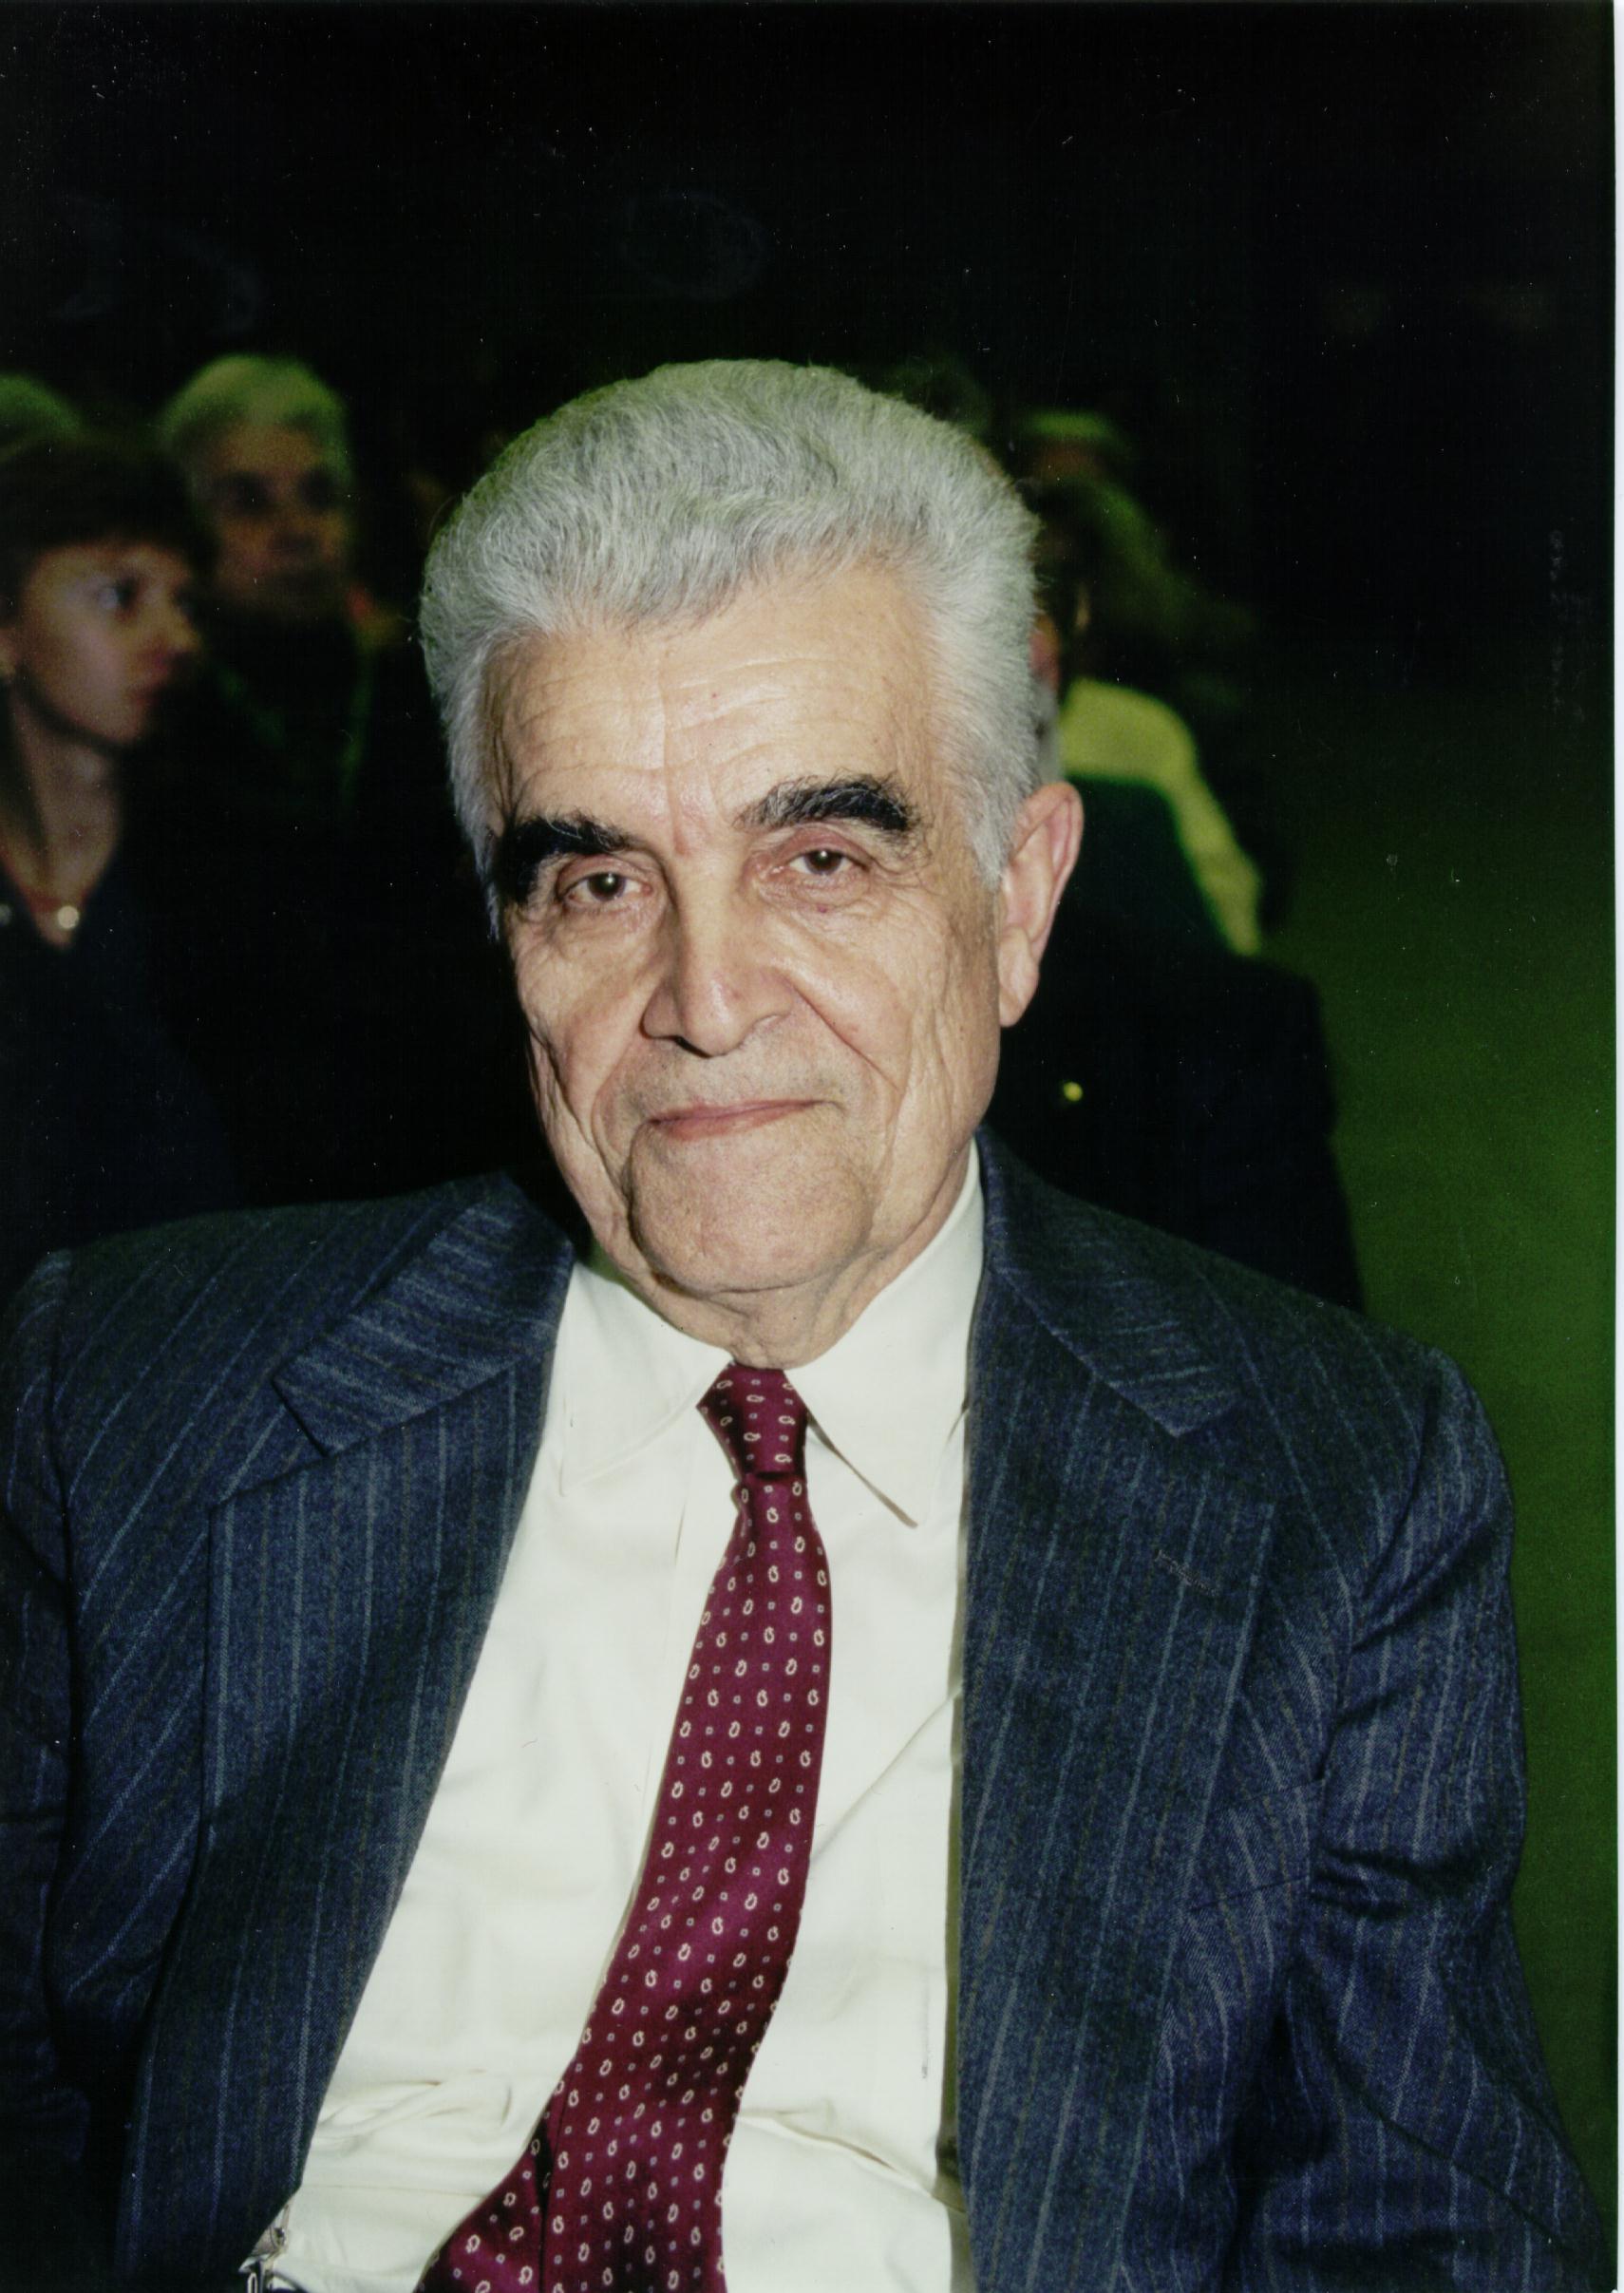 1996, IX edizione: René Girard